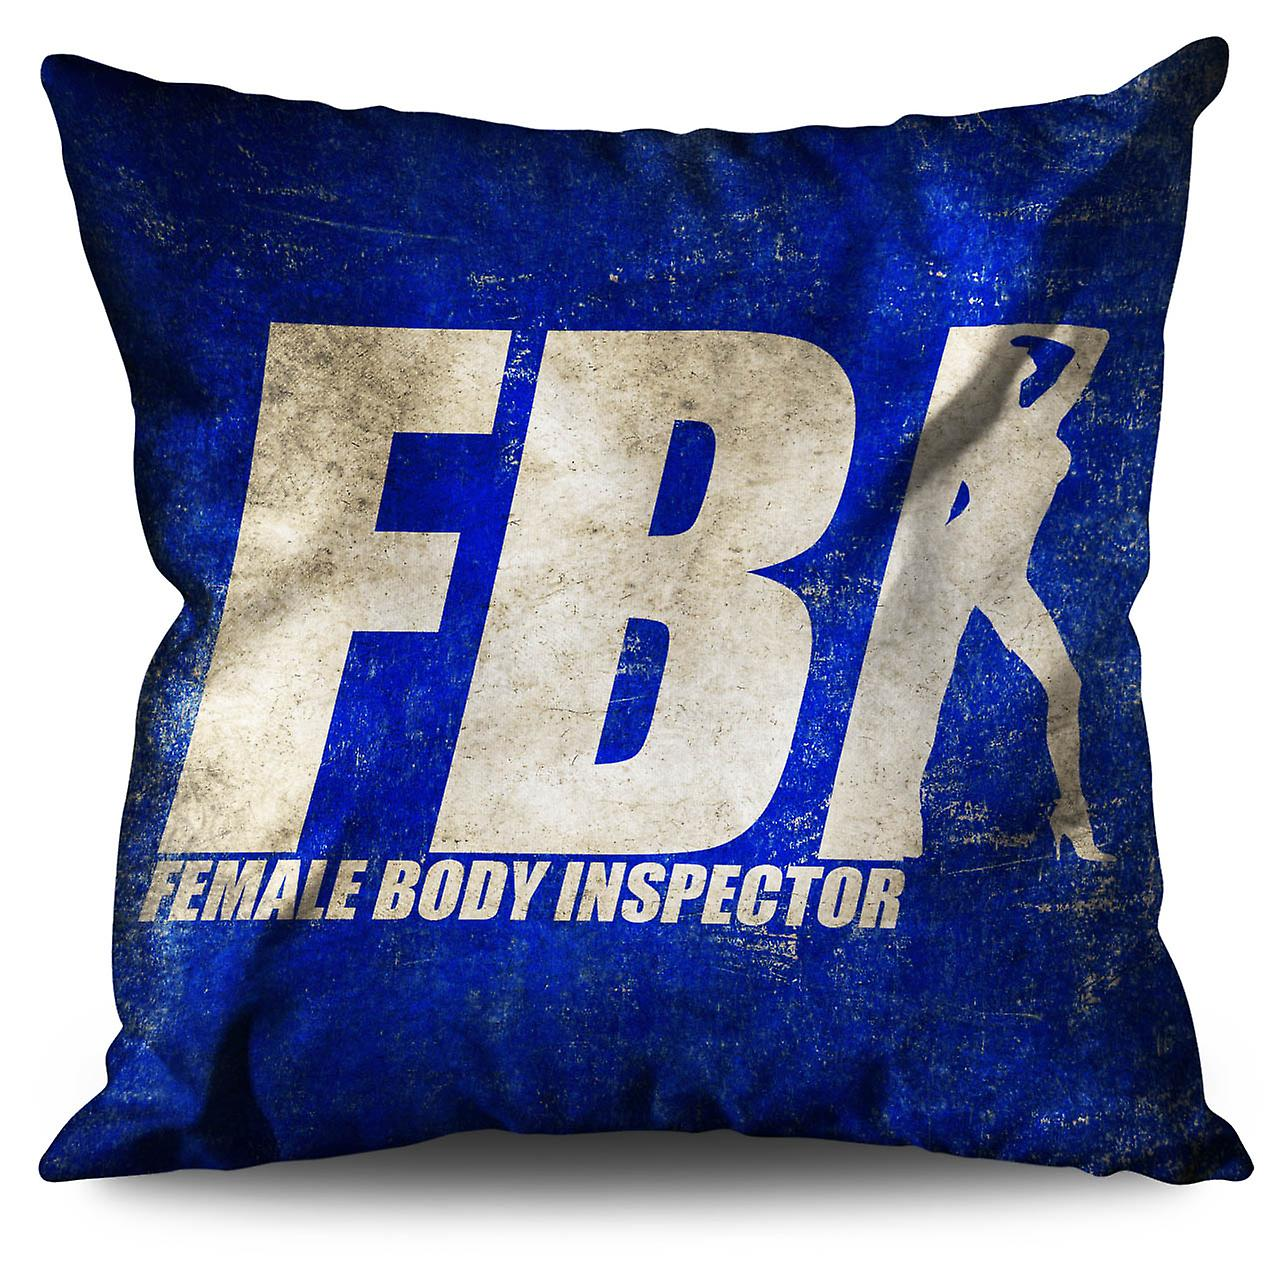 30cm Linen Cushion Offensive Funny XWellcoda Joke b7IYfym6vg